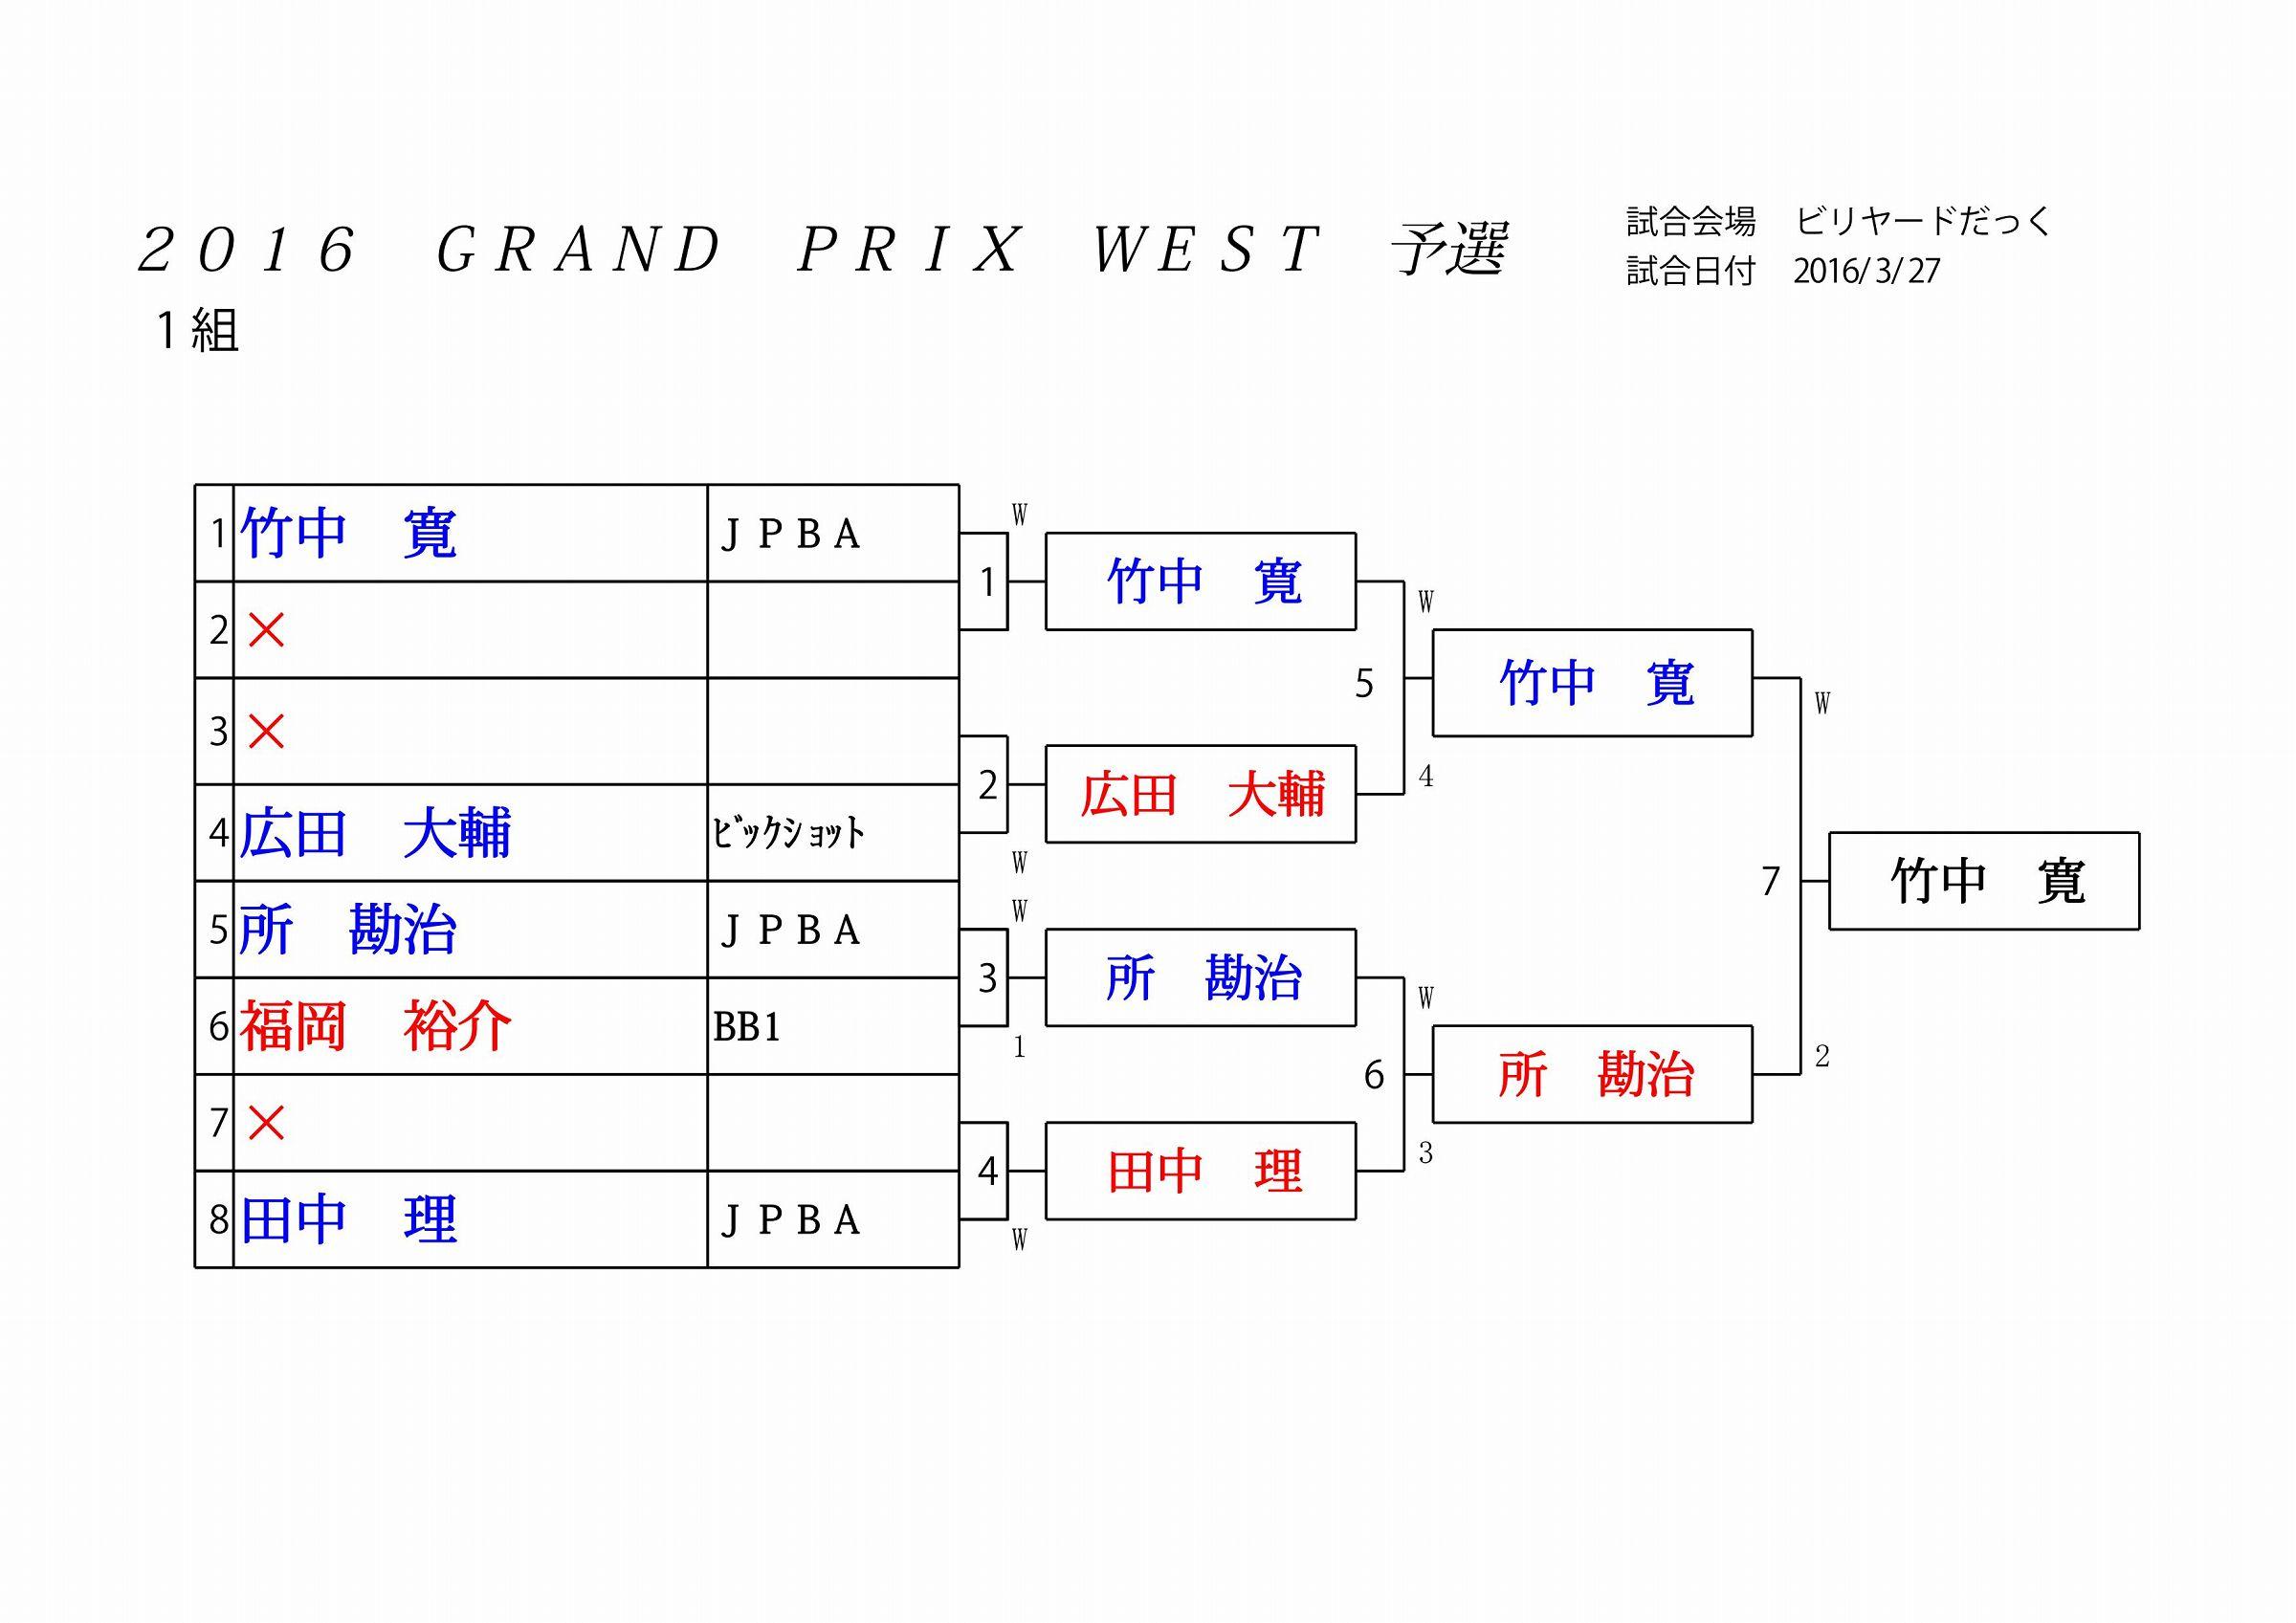 2016 GRAND PRIX WEST 予選_01